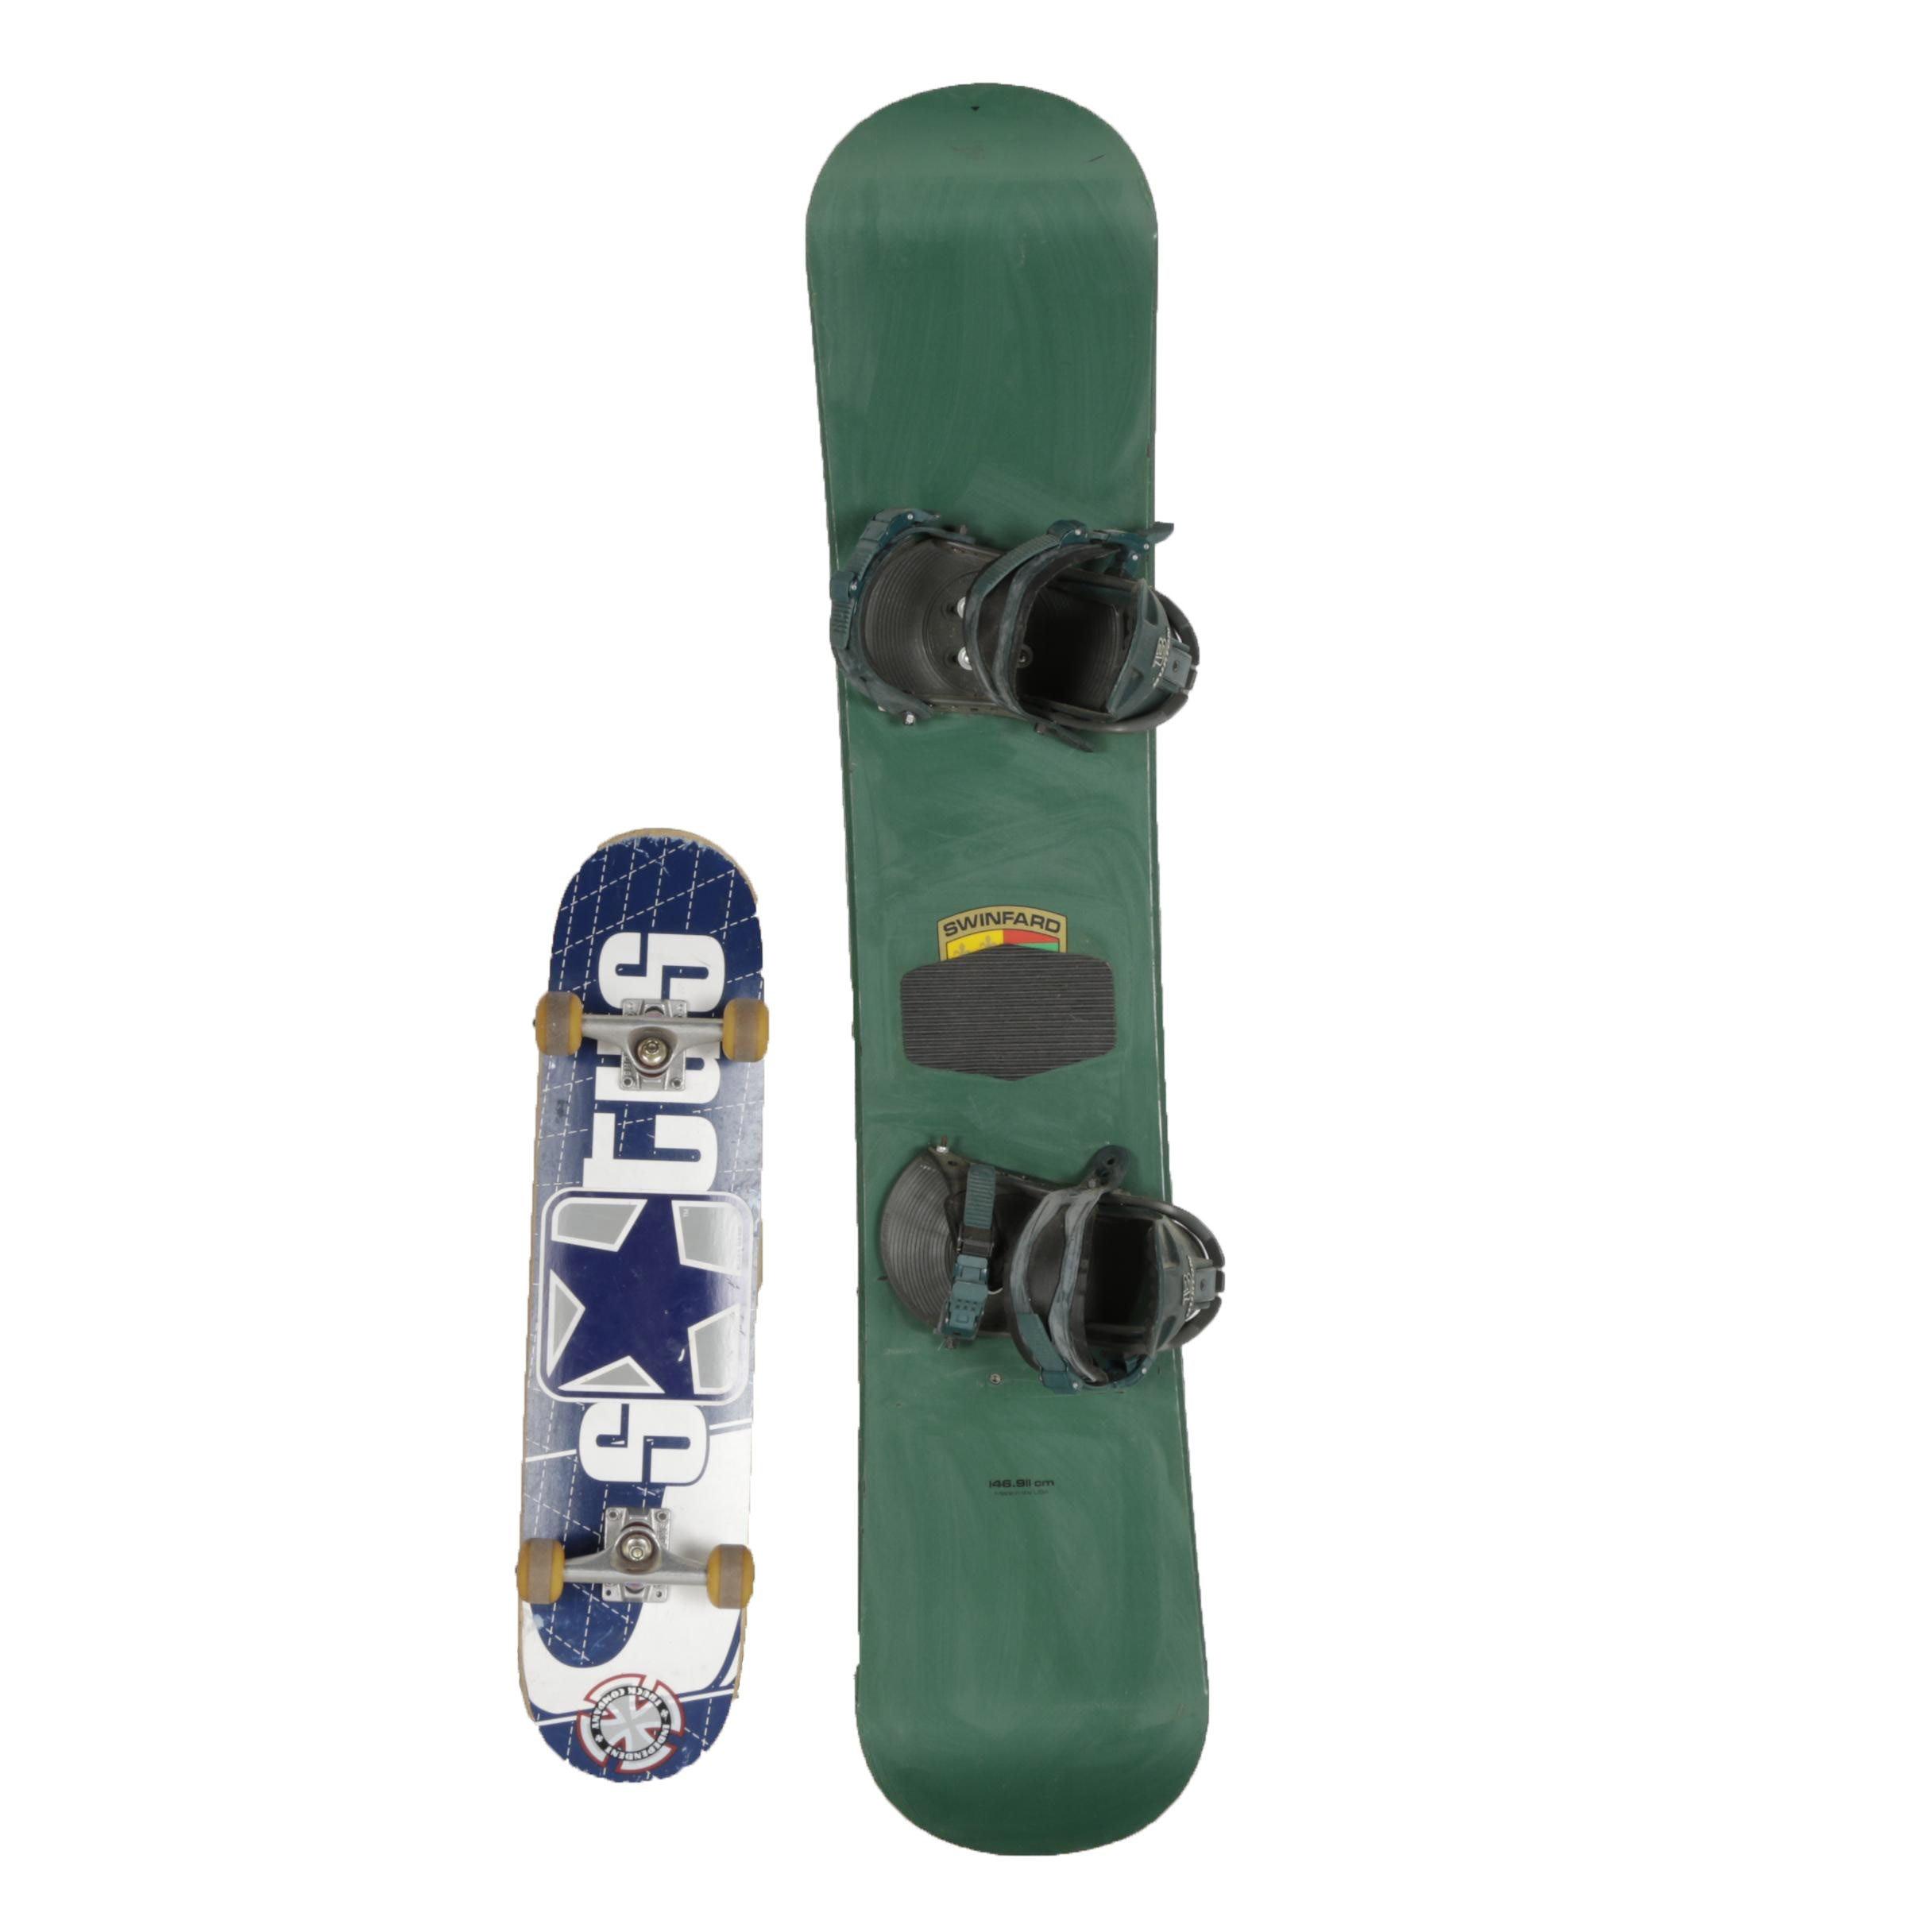 Evol Snowboard and Status Skateboard